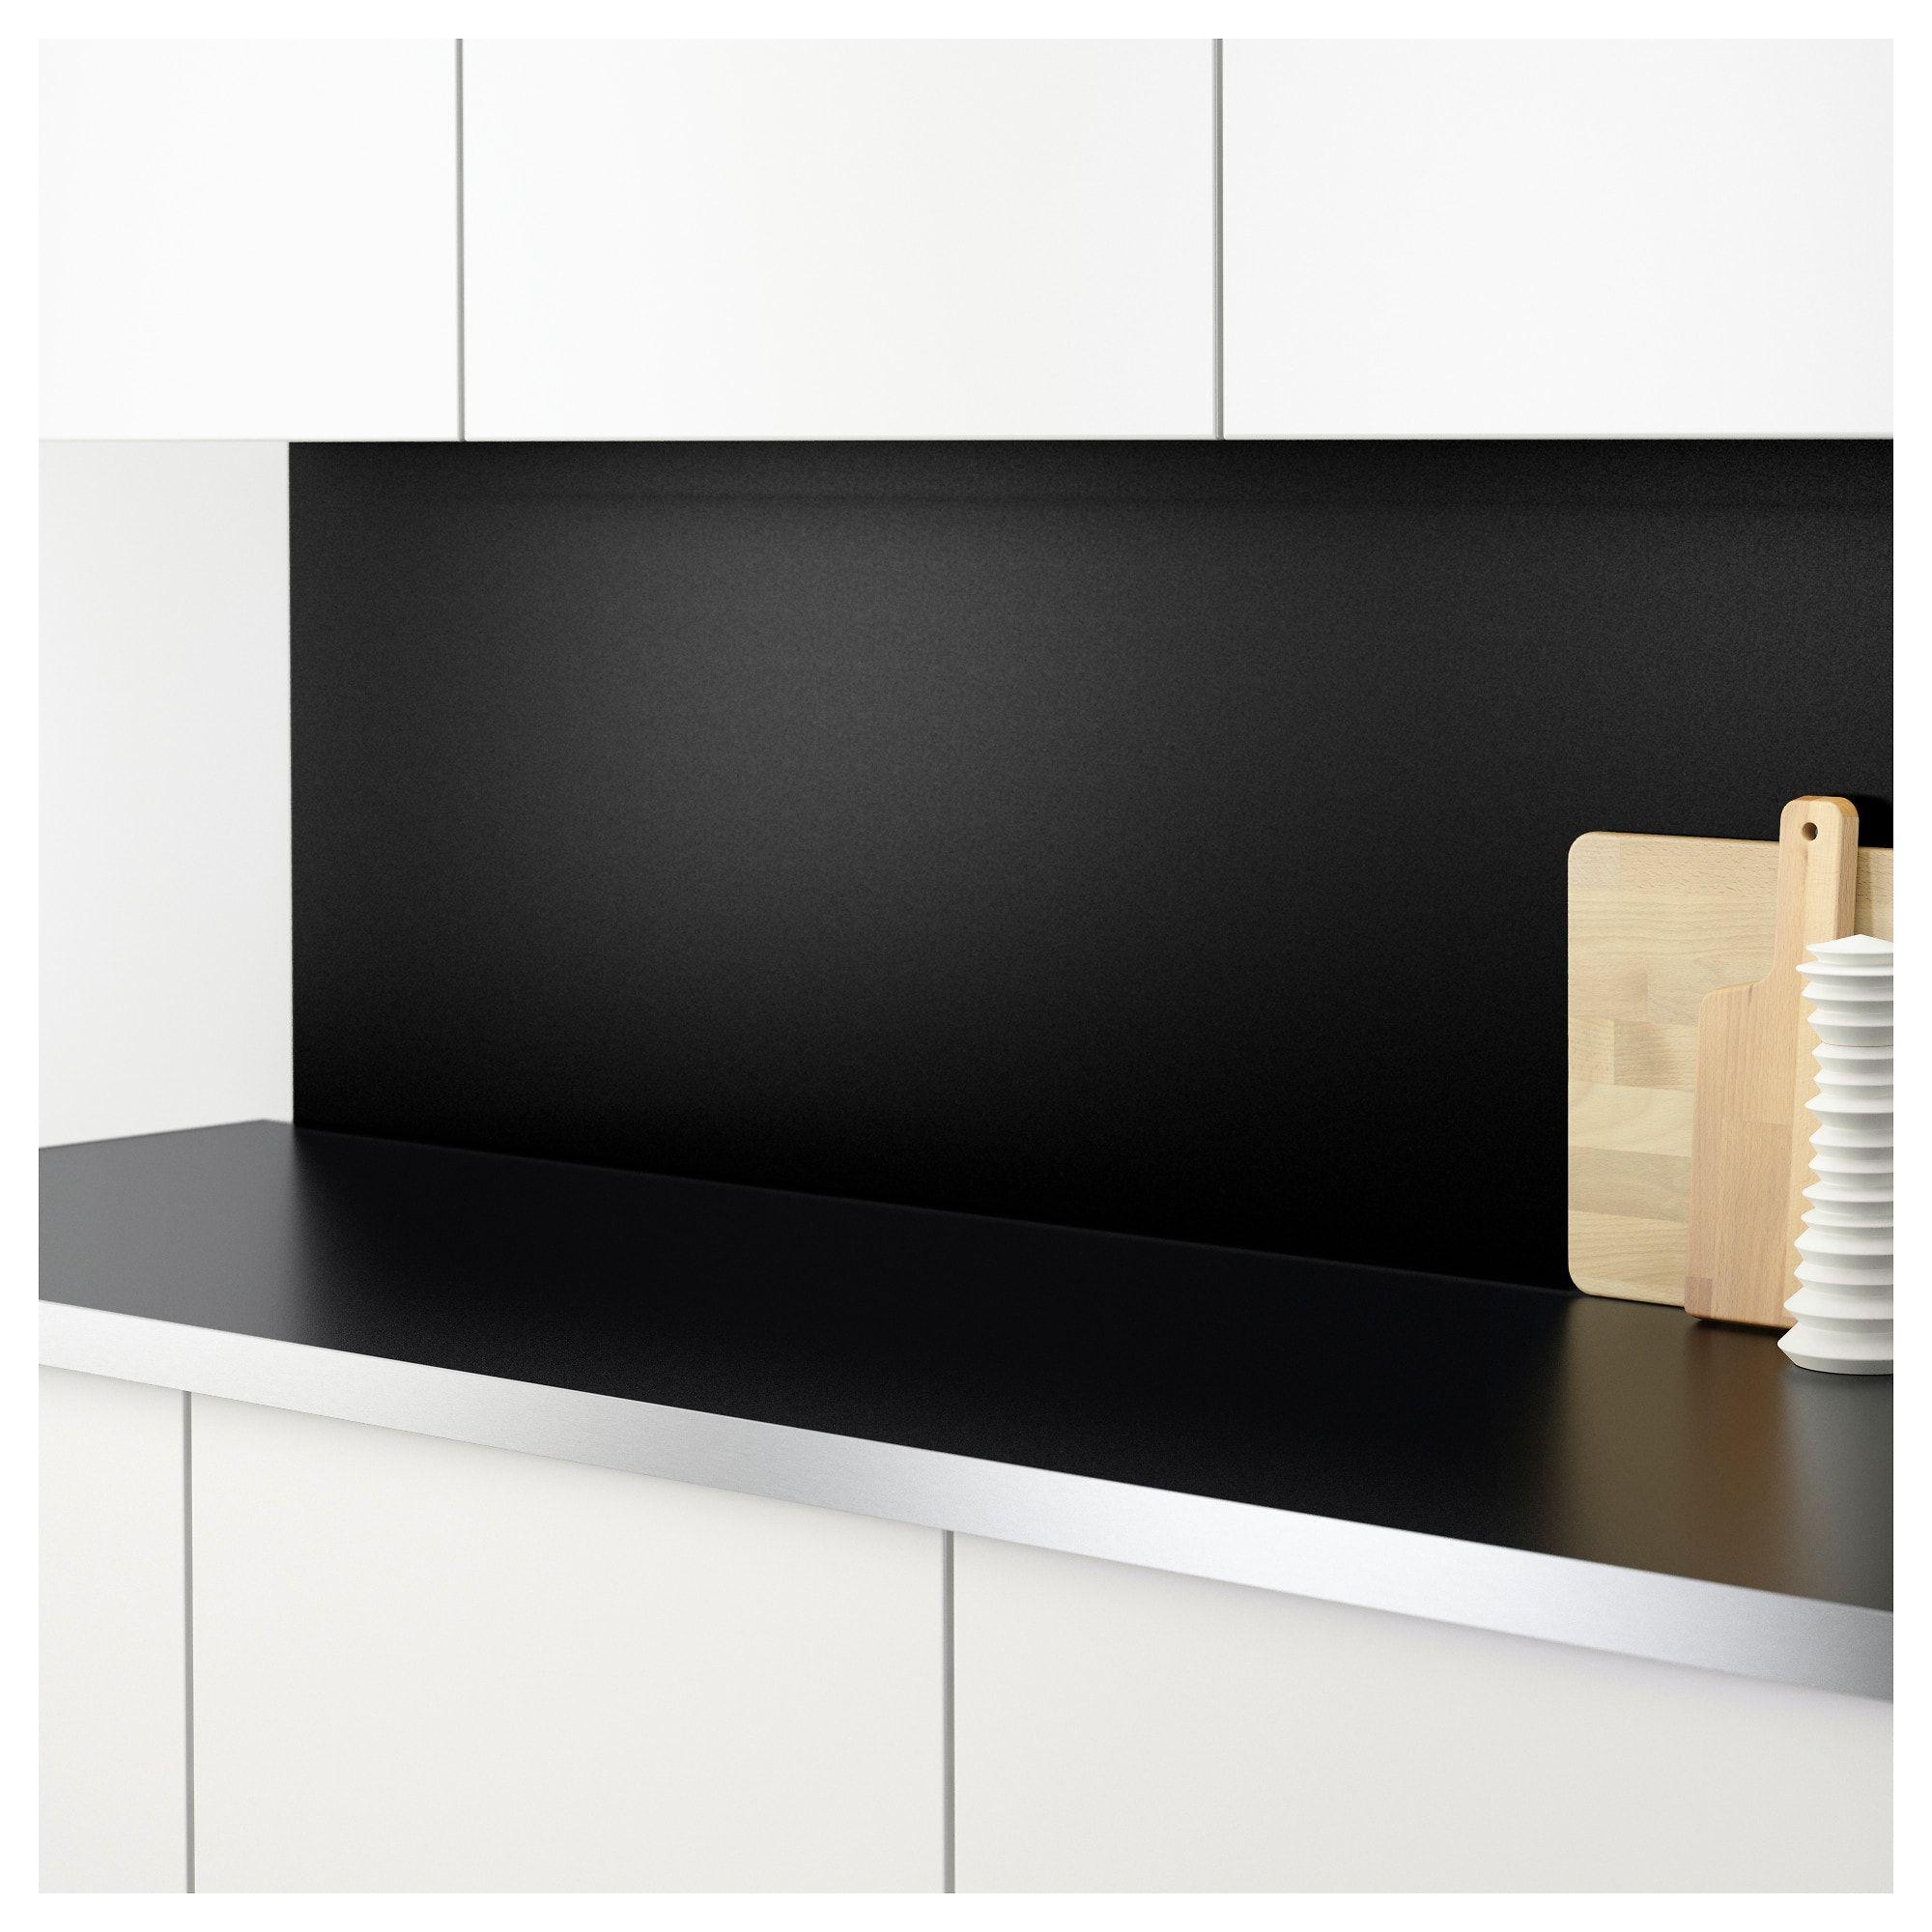 Sibbarp Wandpaneel Massgefertigt Schwarz Laminat Decoration Interieure Et Exterieure Ikea Parement Mural